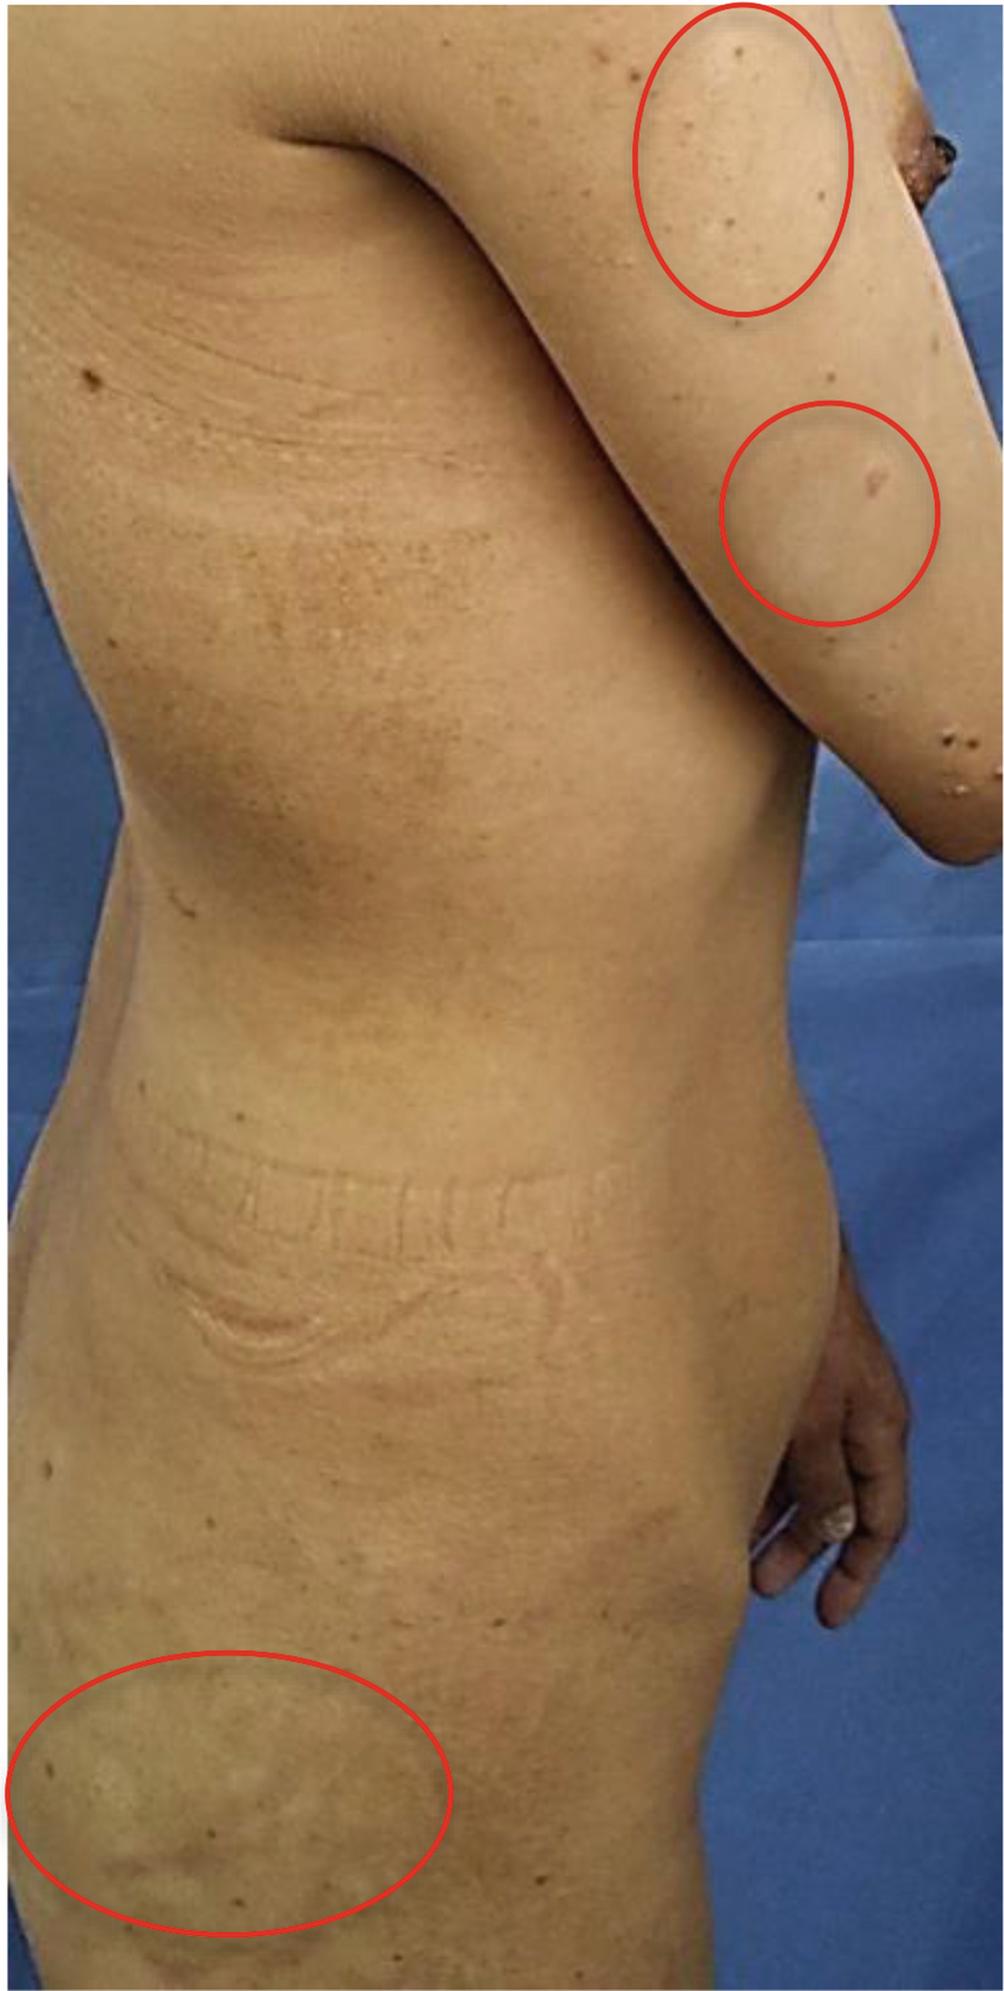 Alopecia Nail Dystrophy Vitiligo And Hypoparathyroidism Springerlink